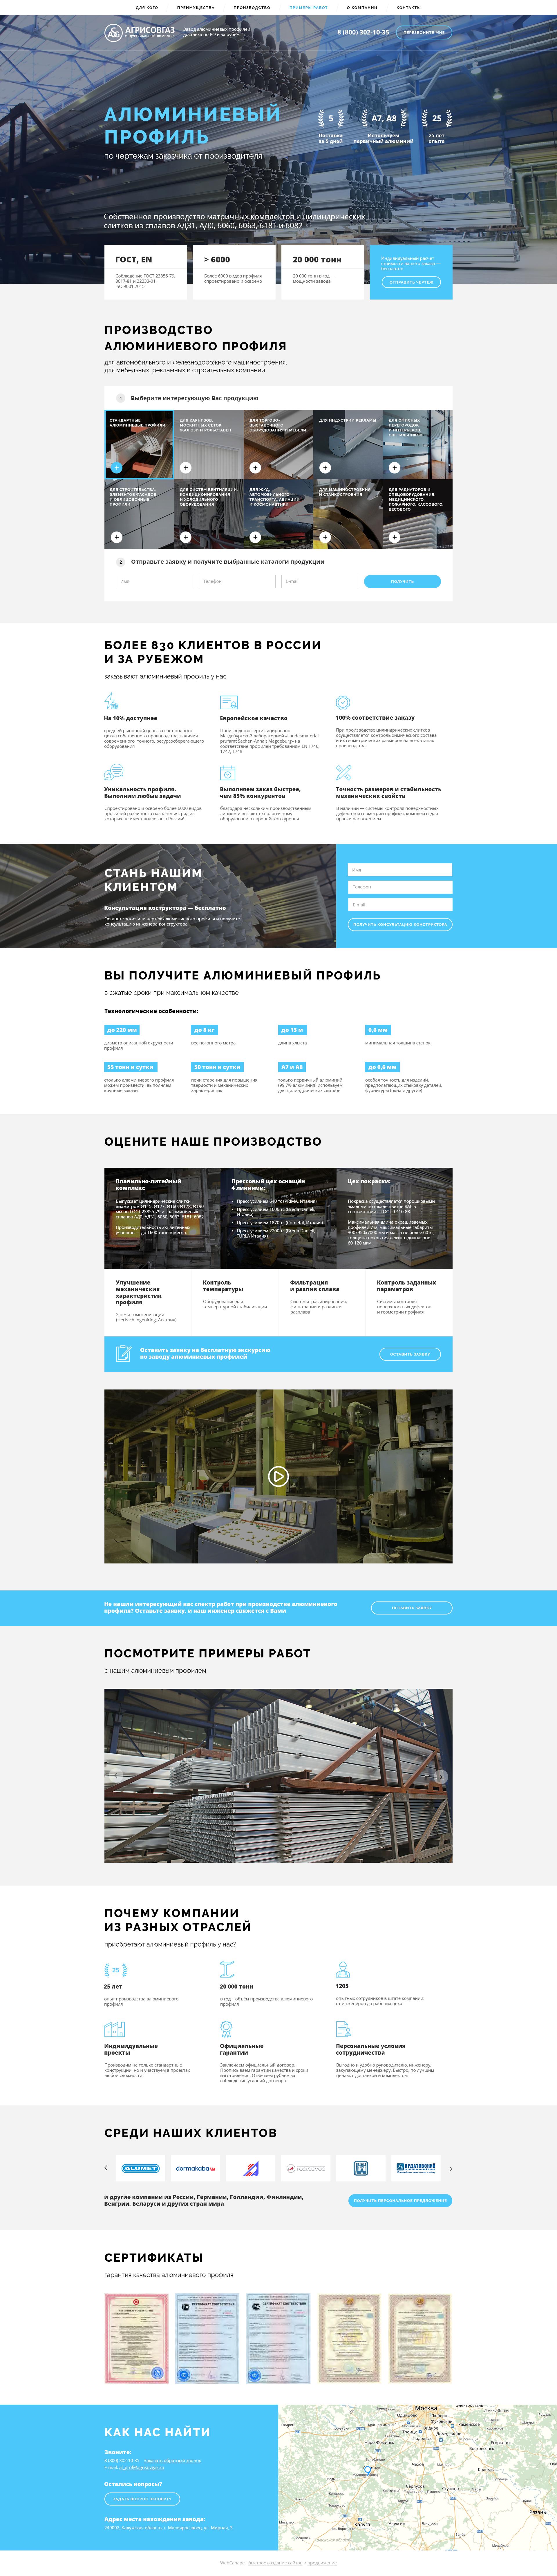 Лендинг компании «Агрисовгаз» по производству алюминиевого профиля